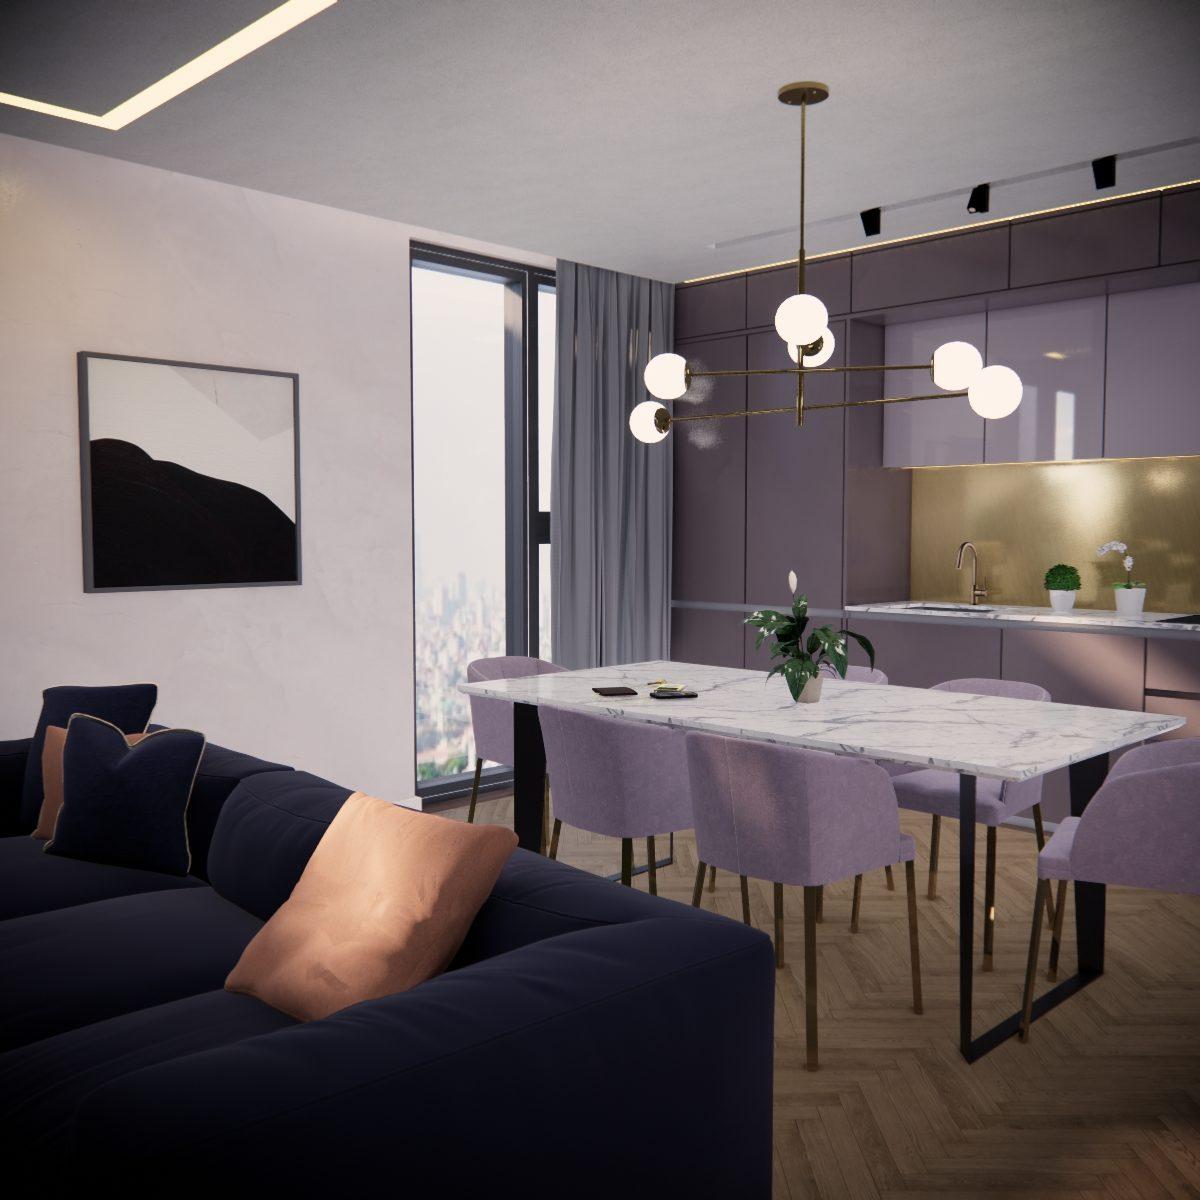 Minimalist interiors by Michael O Mara